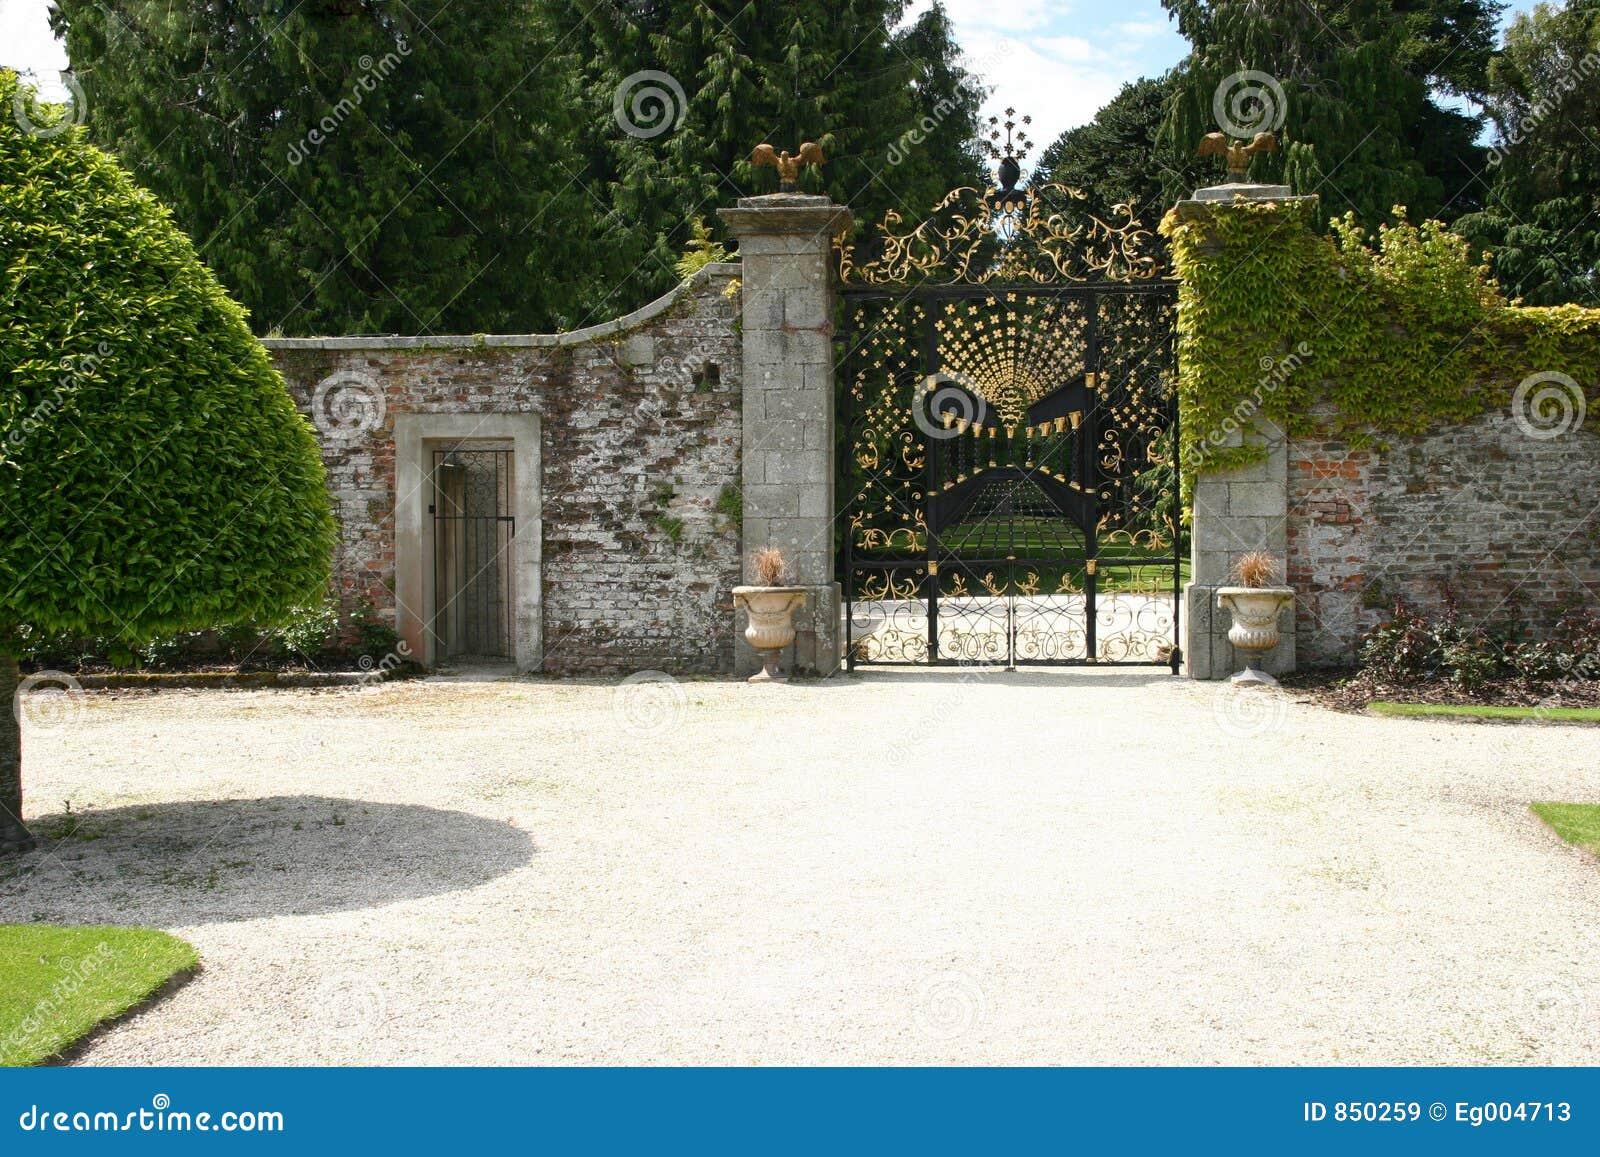 Gate At Powerscourt House Gardens Stock Image Image 850259